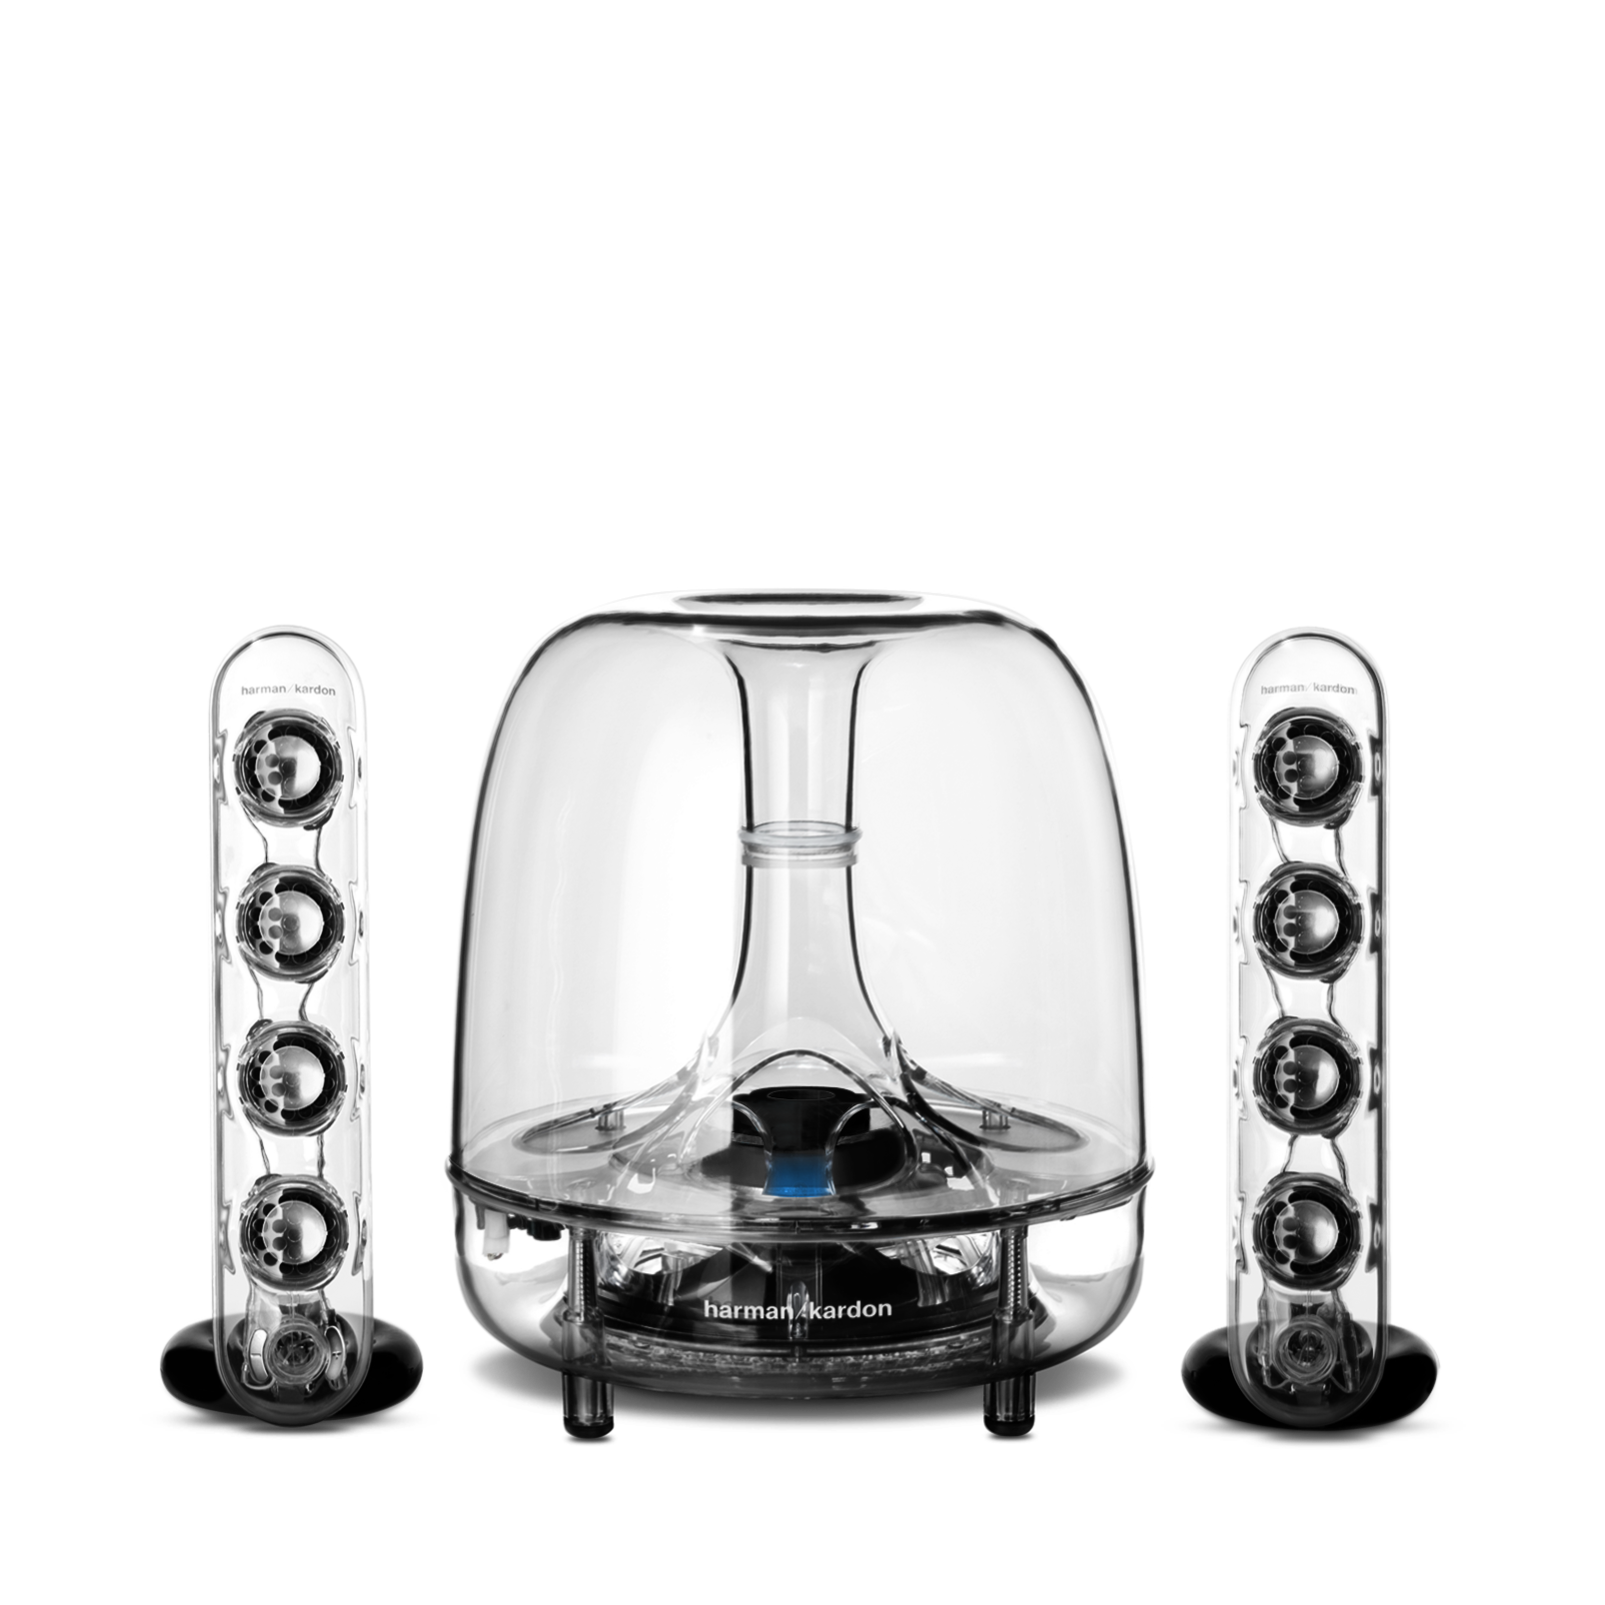 Harman Kardon Speakers >> Soundsticks Wireless Award Winning Bluetooth Computer Speakers